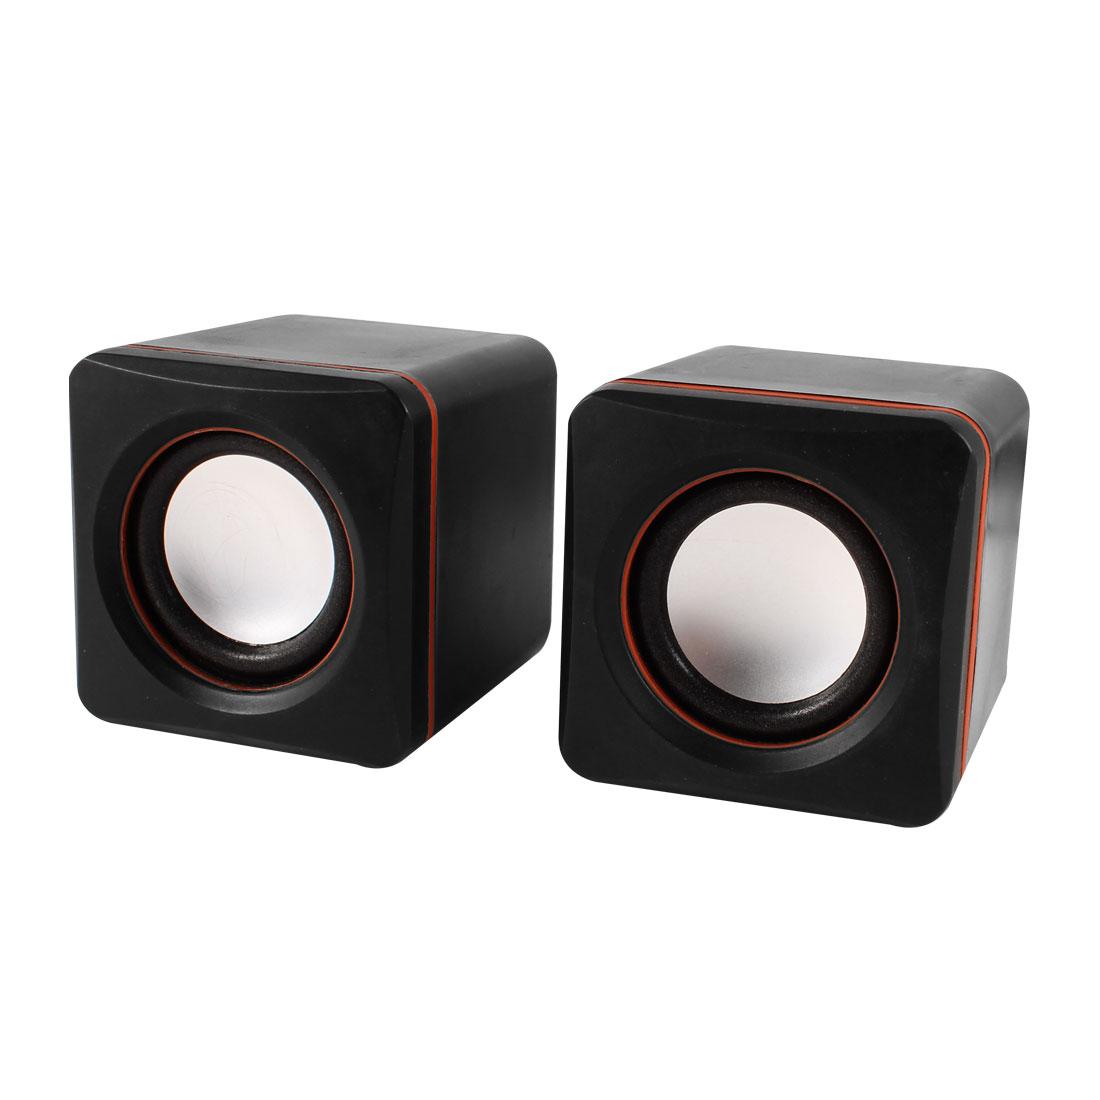 Pair Black Plastic Cube Design USB 2.0 3.5mm Stereo Mini Multimedia Speaker